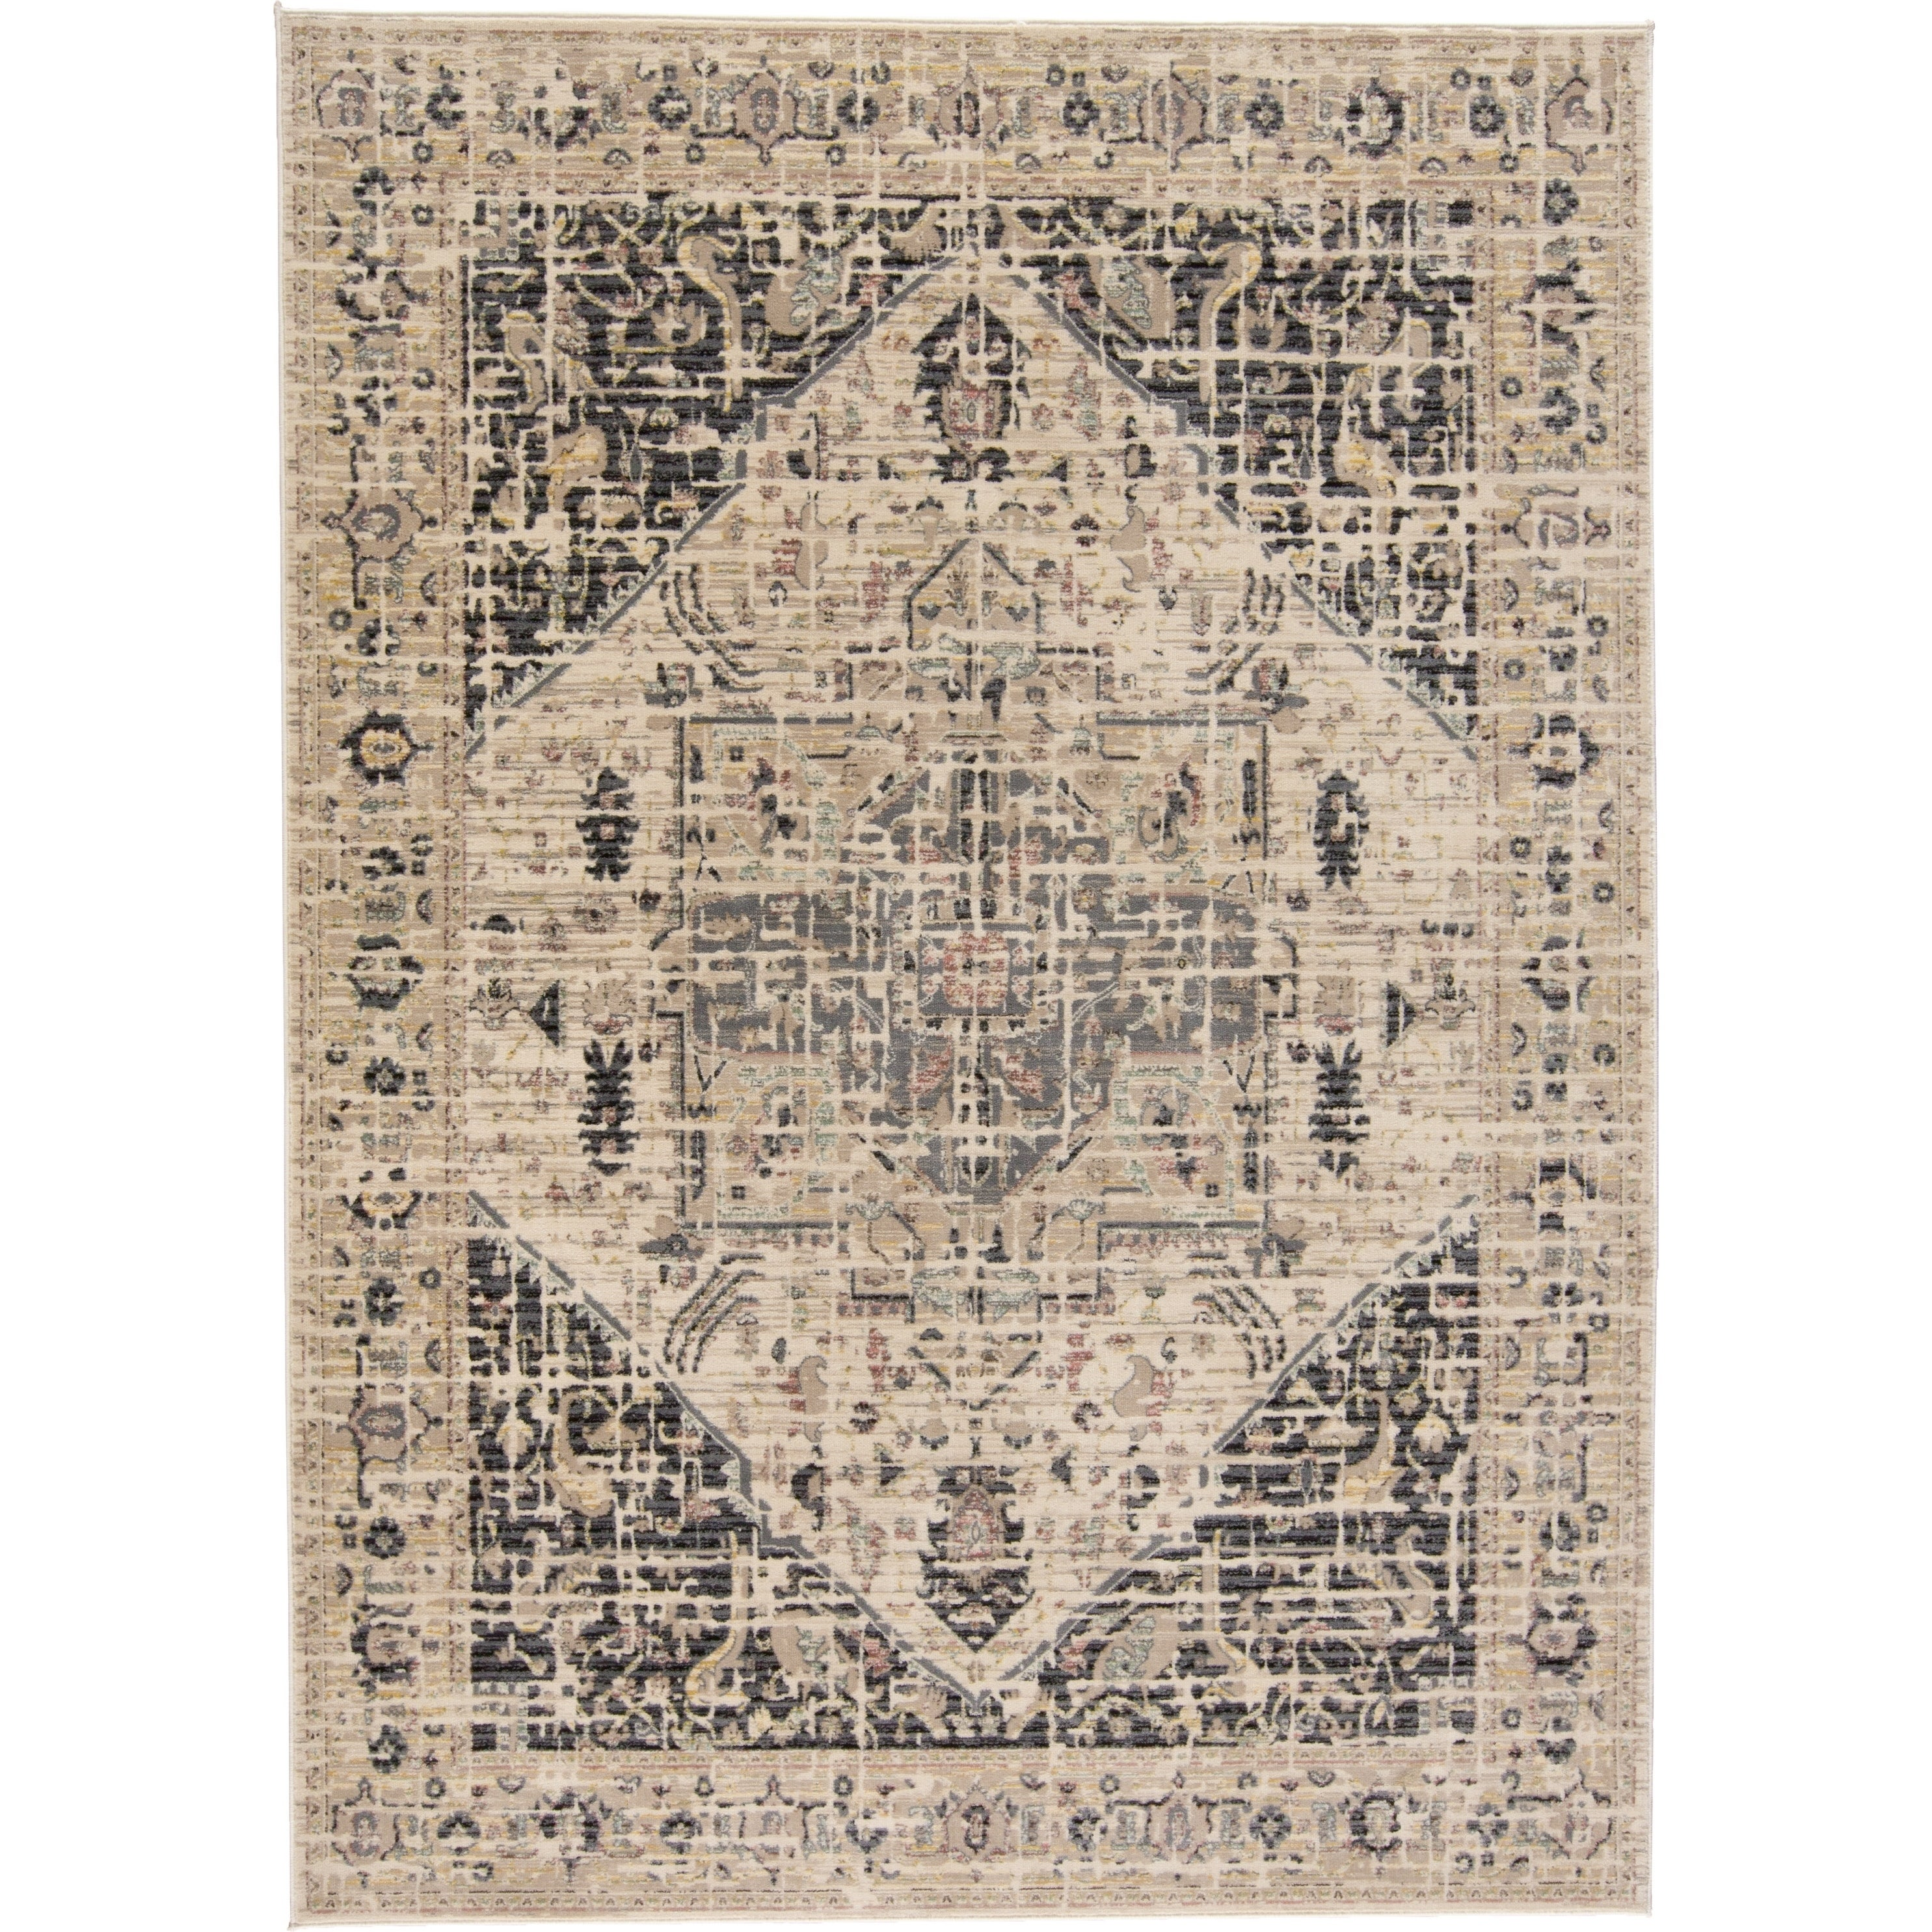 Grand Bazaar Huron Charcoal/Beige (411 x 78) - 411 x 78 (Charcoal/Beige - 411 x 78)